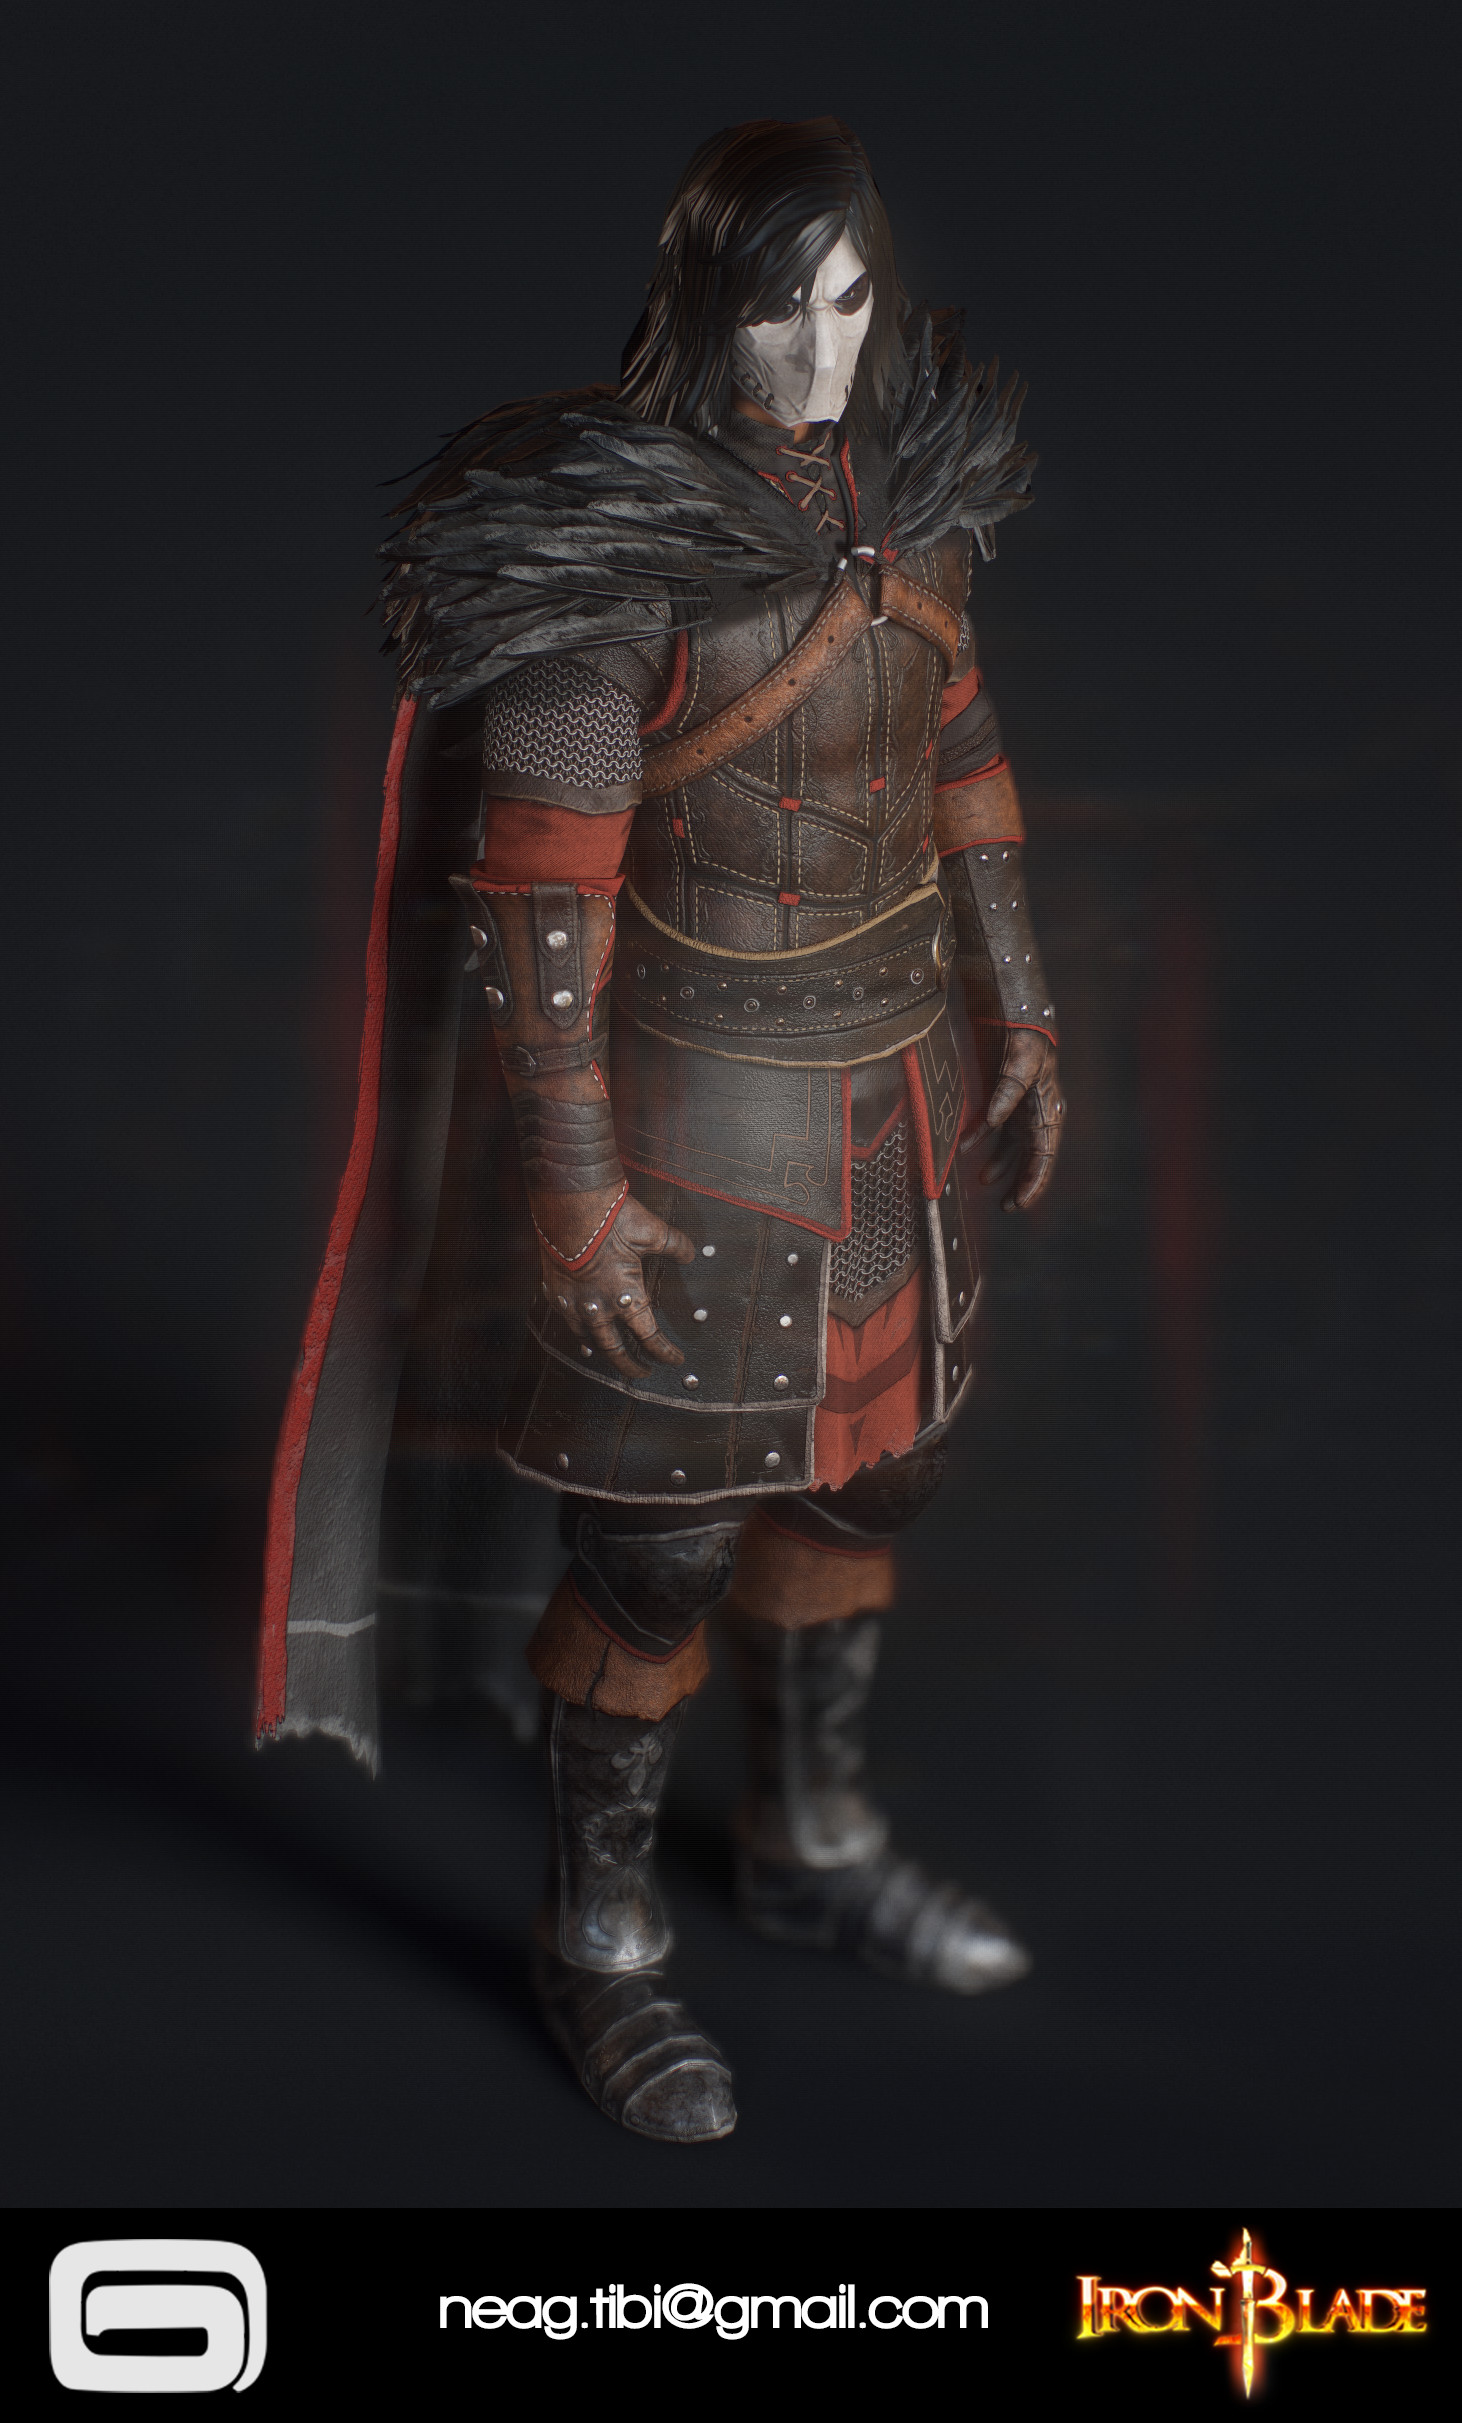 Tibi neag tibi neag iron blade mc armor 11c low poly 03